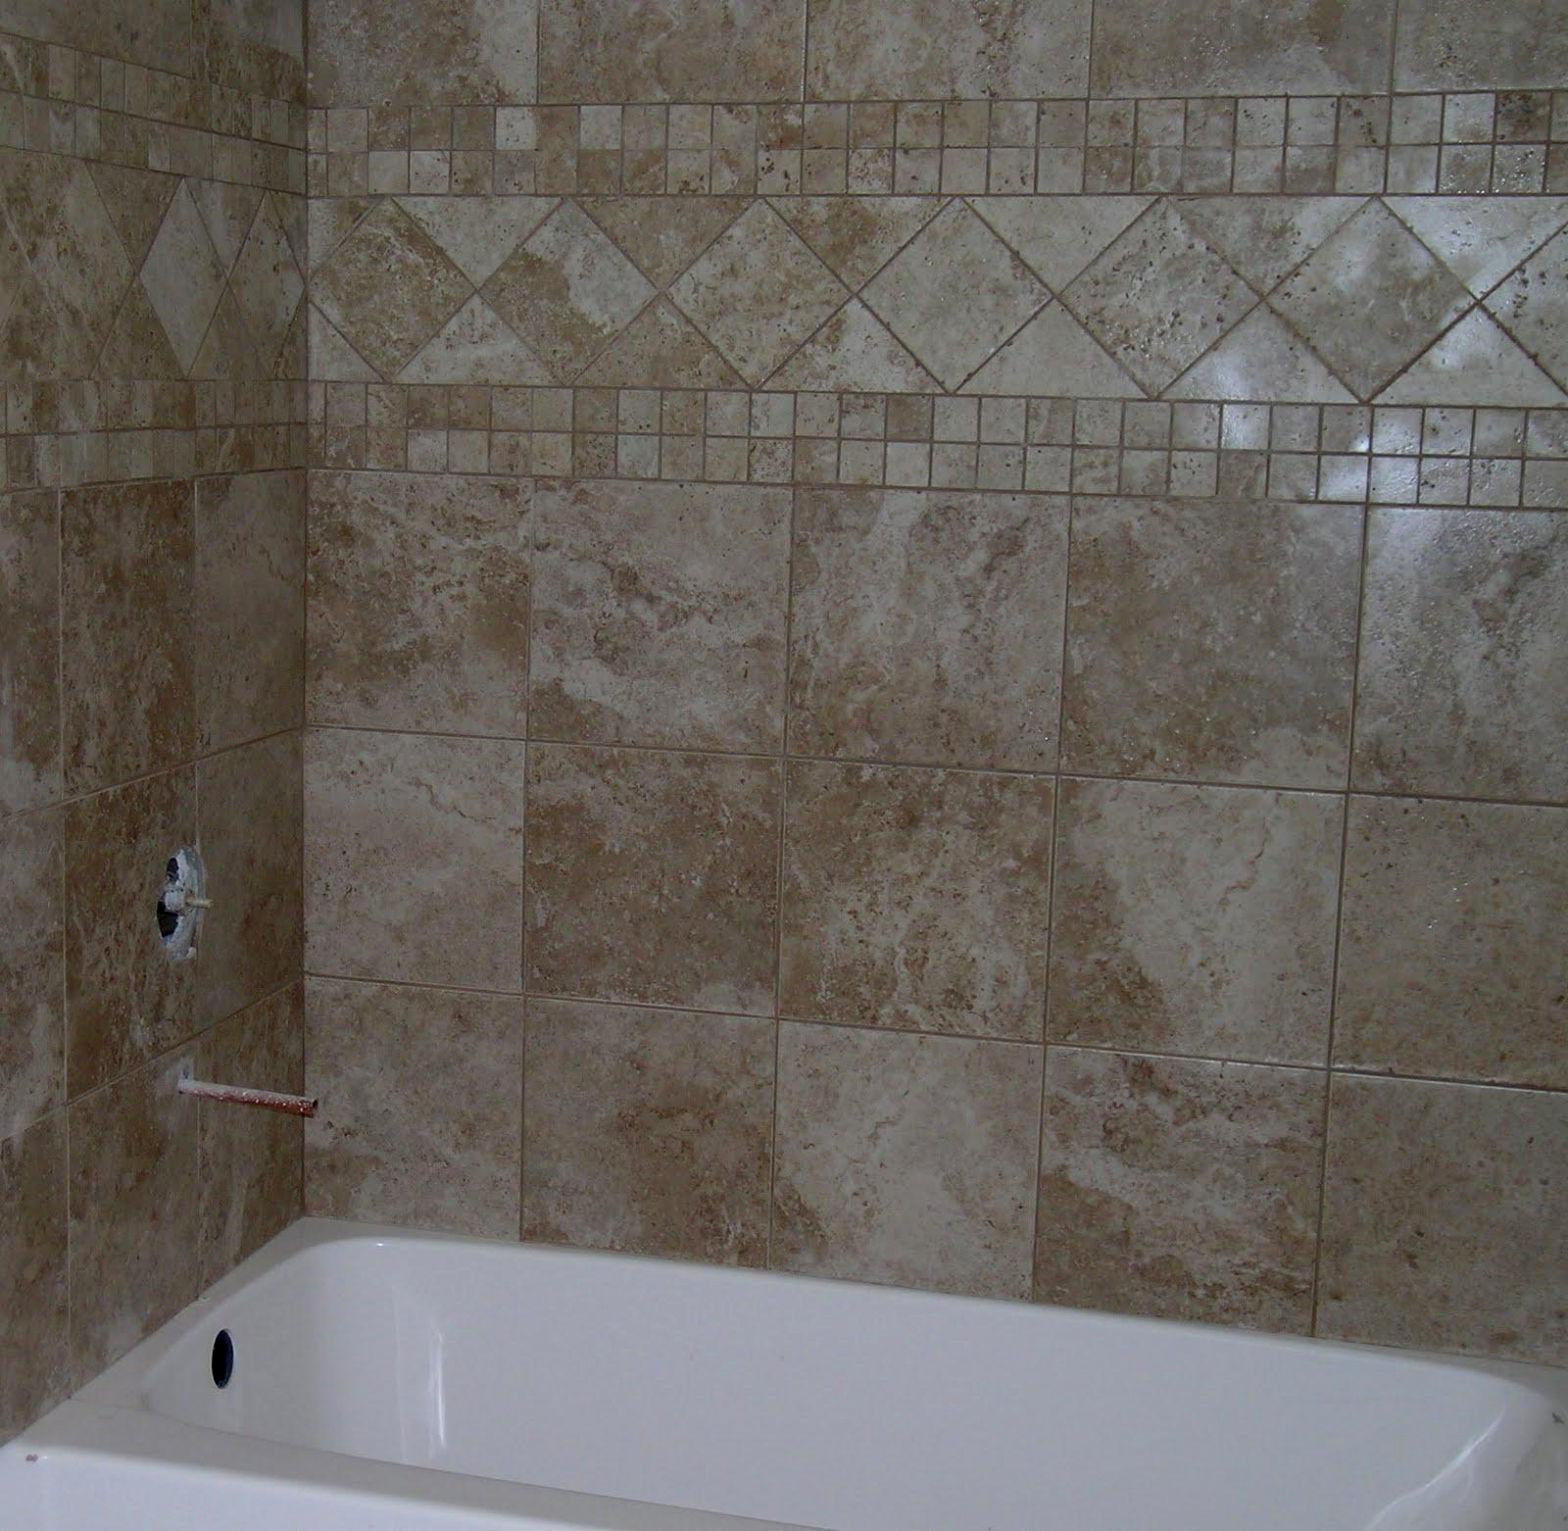 Elegant Peel And Stick Bathroom Wall Tiles Photo